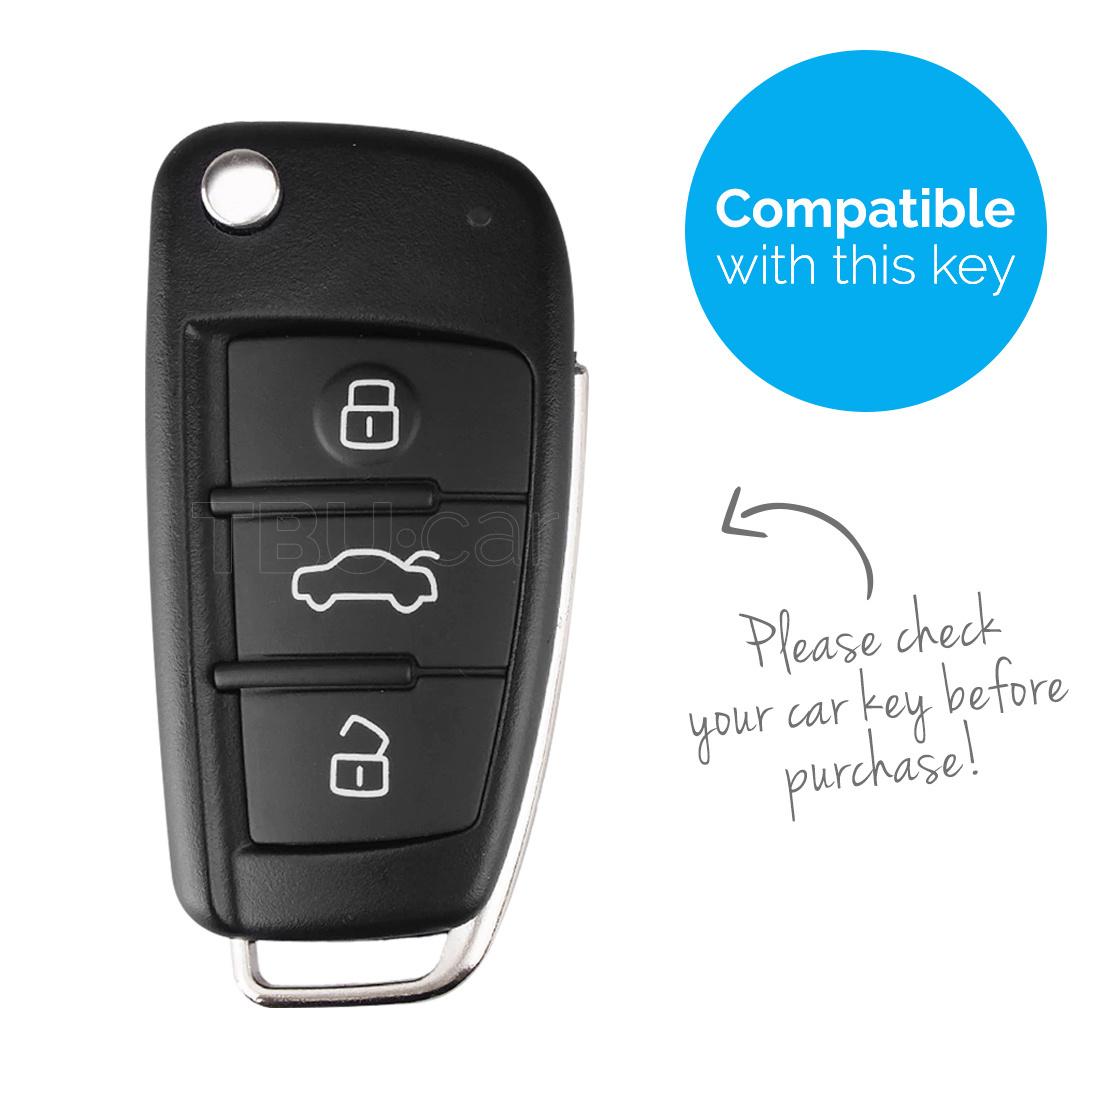 TBU car TBU car Autoschlüssel Hülle kompatibel mit Audi 3 Tasten - Schutzhülle aus Silikon - Auto Schlüsselhülle Cover in Lindgrün